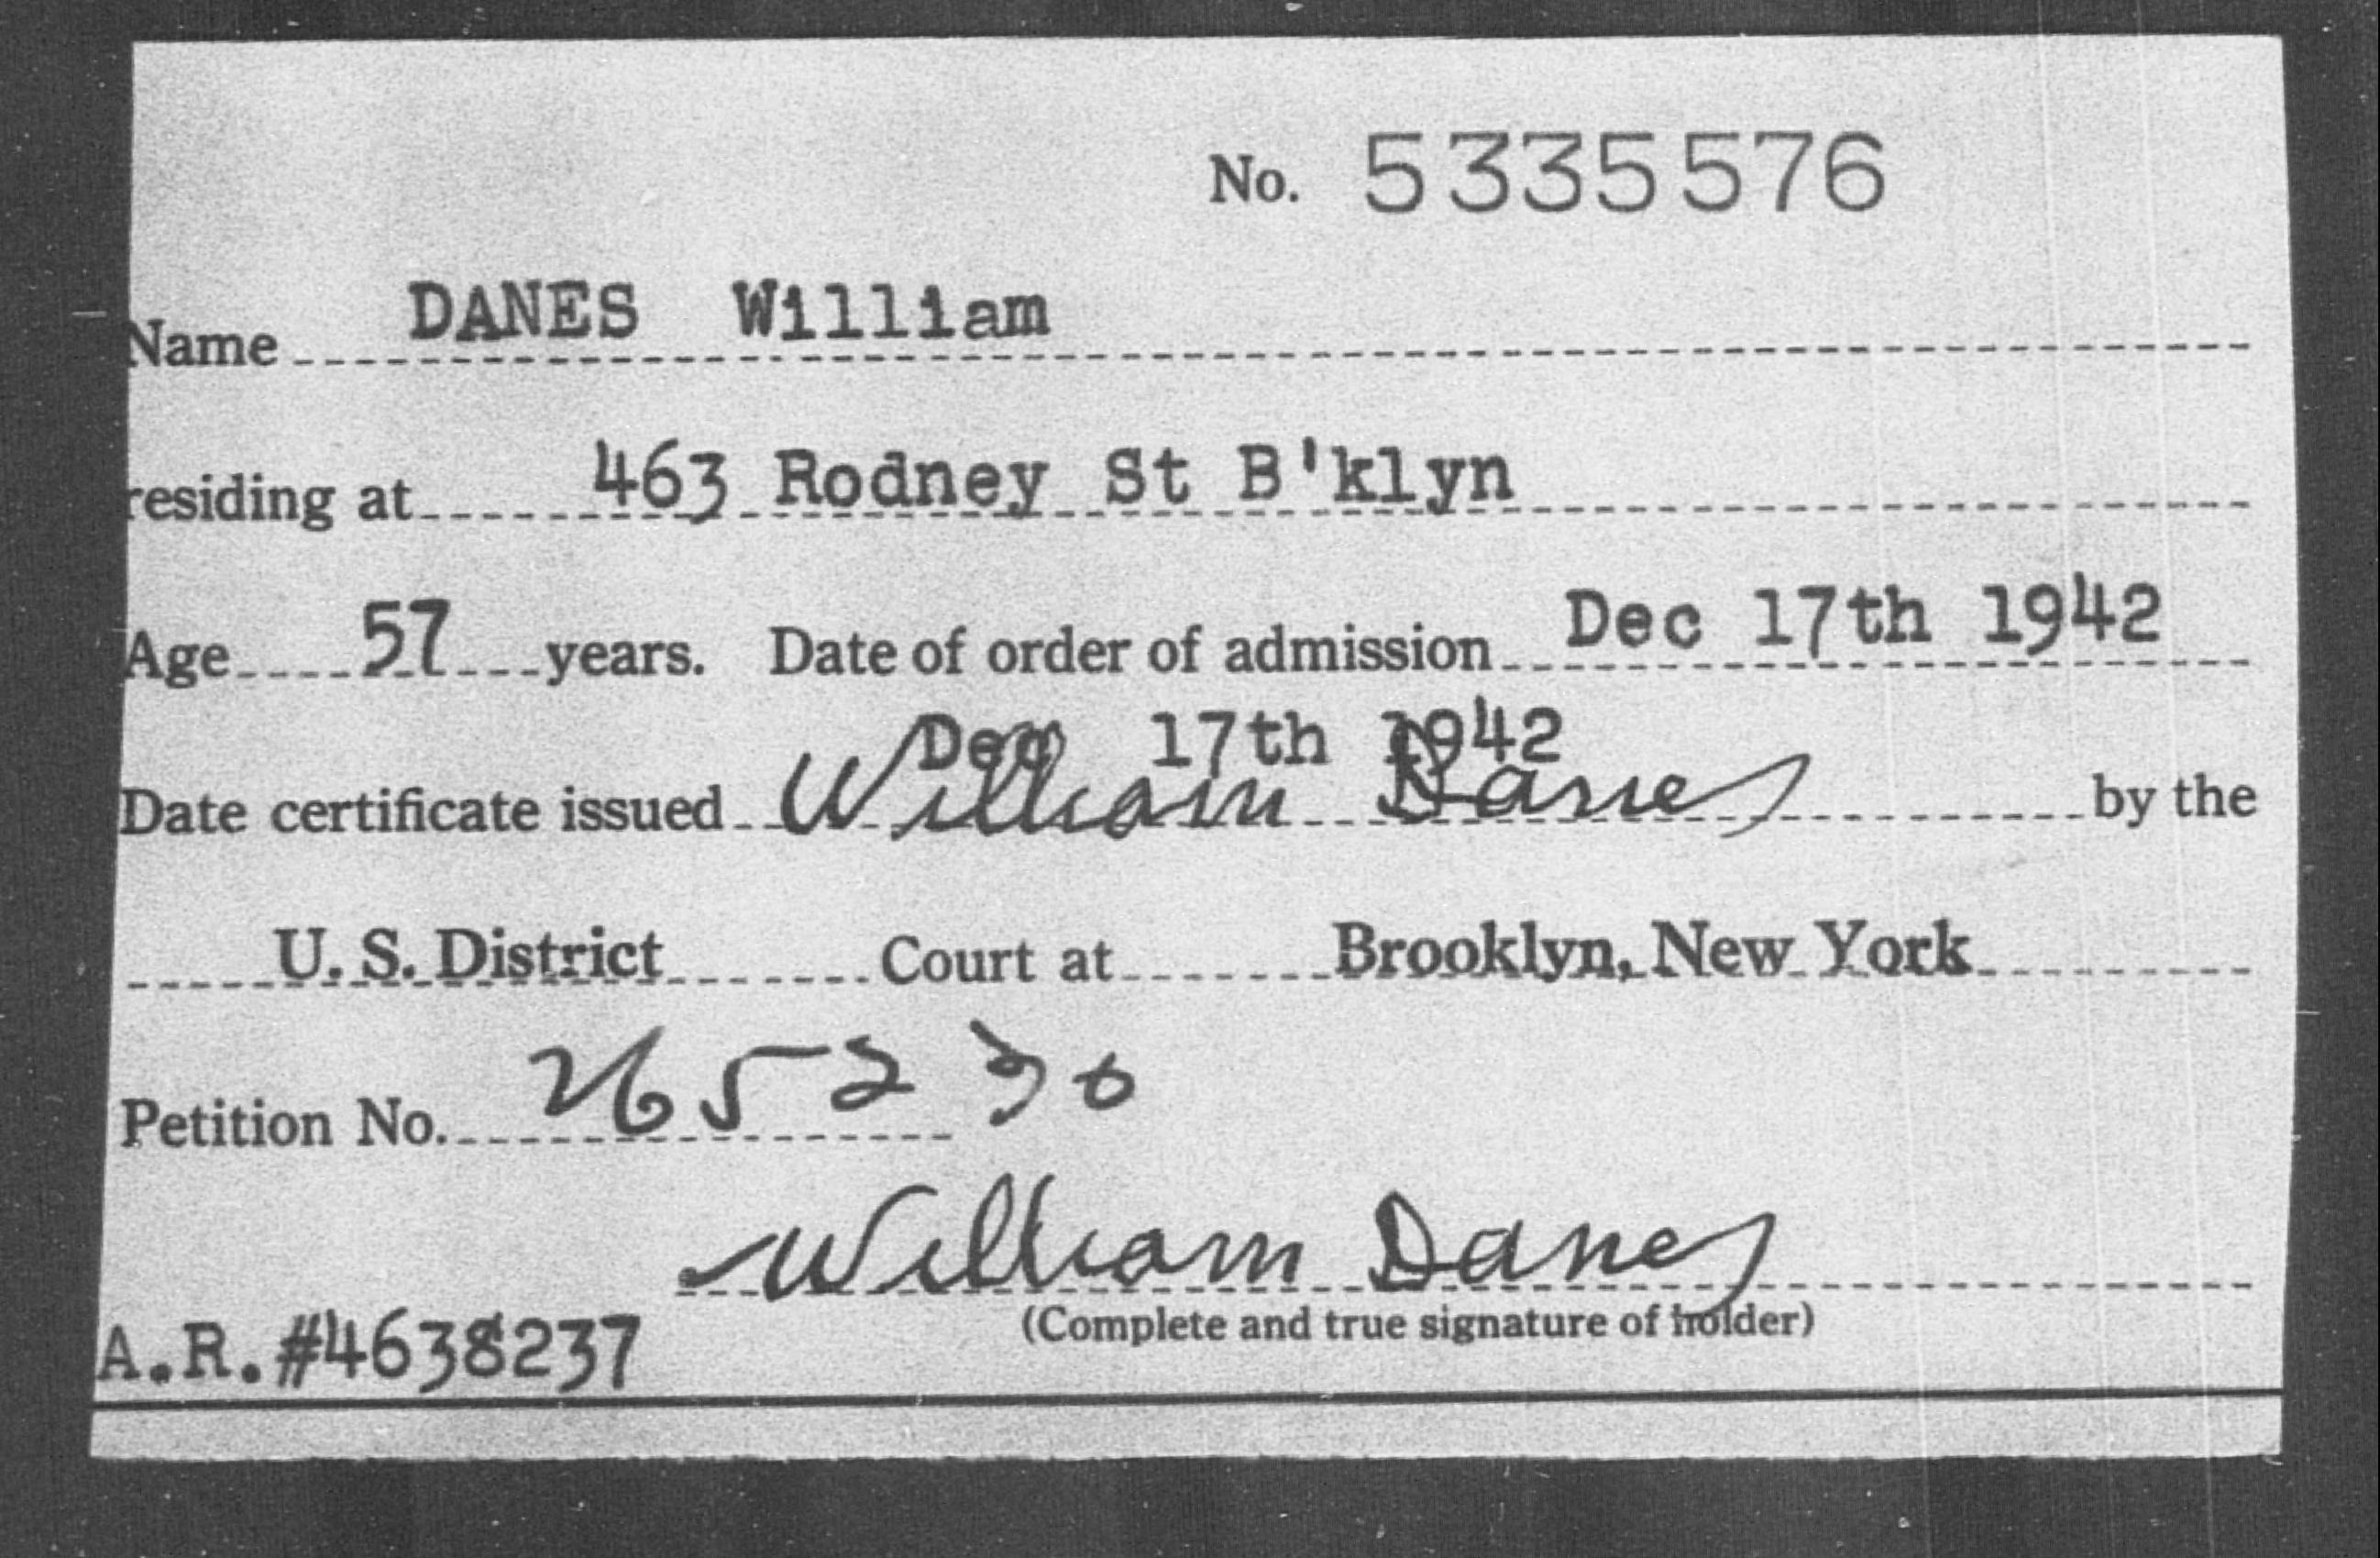 DANES William - Born: [BLANK], Naturalized: 1942